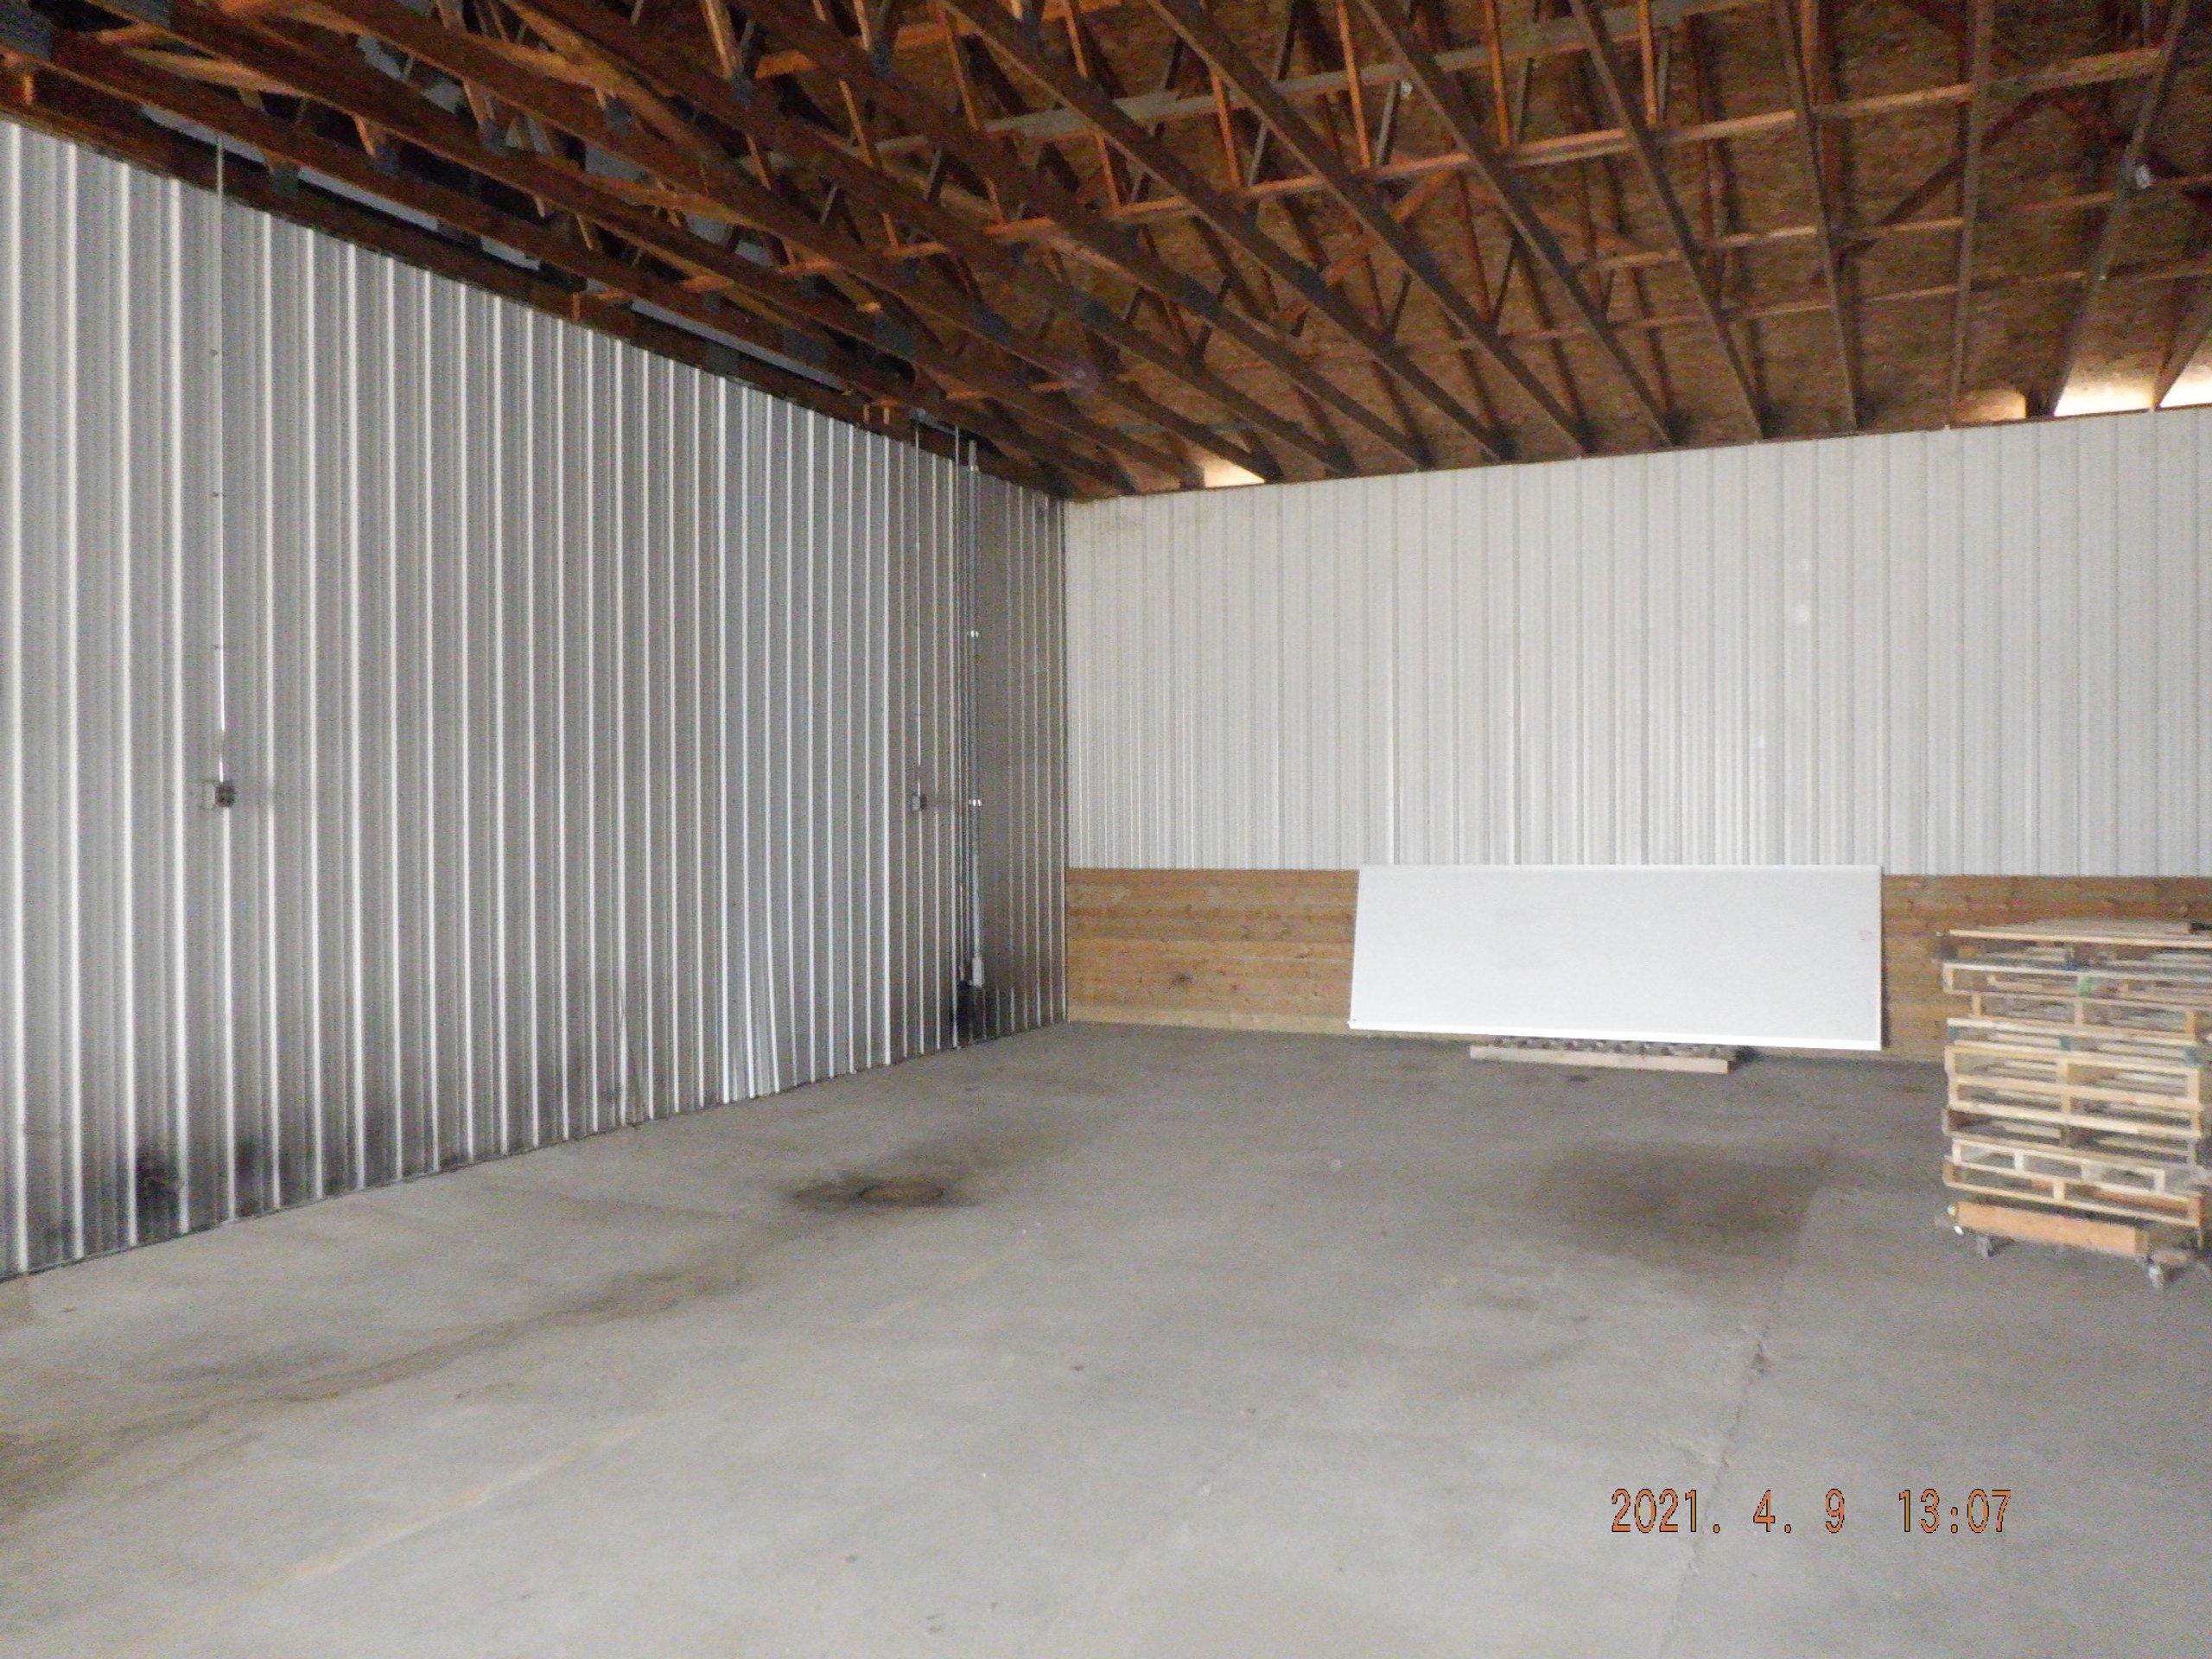 80x60 Warehouse self storage unit